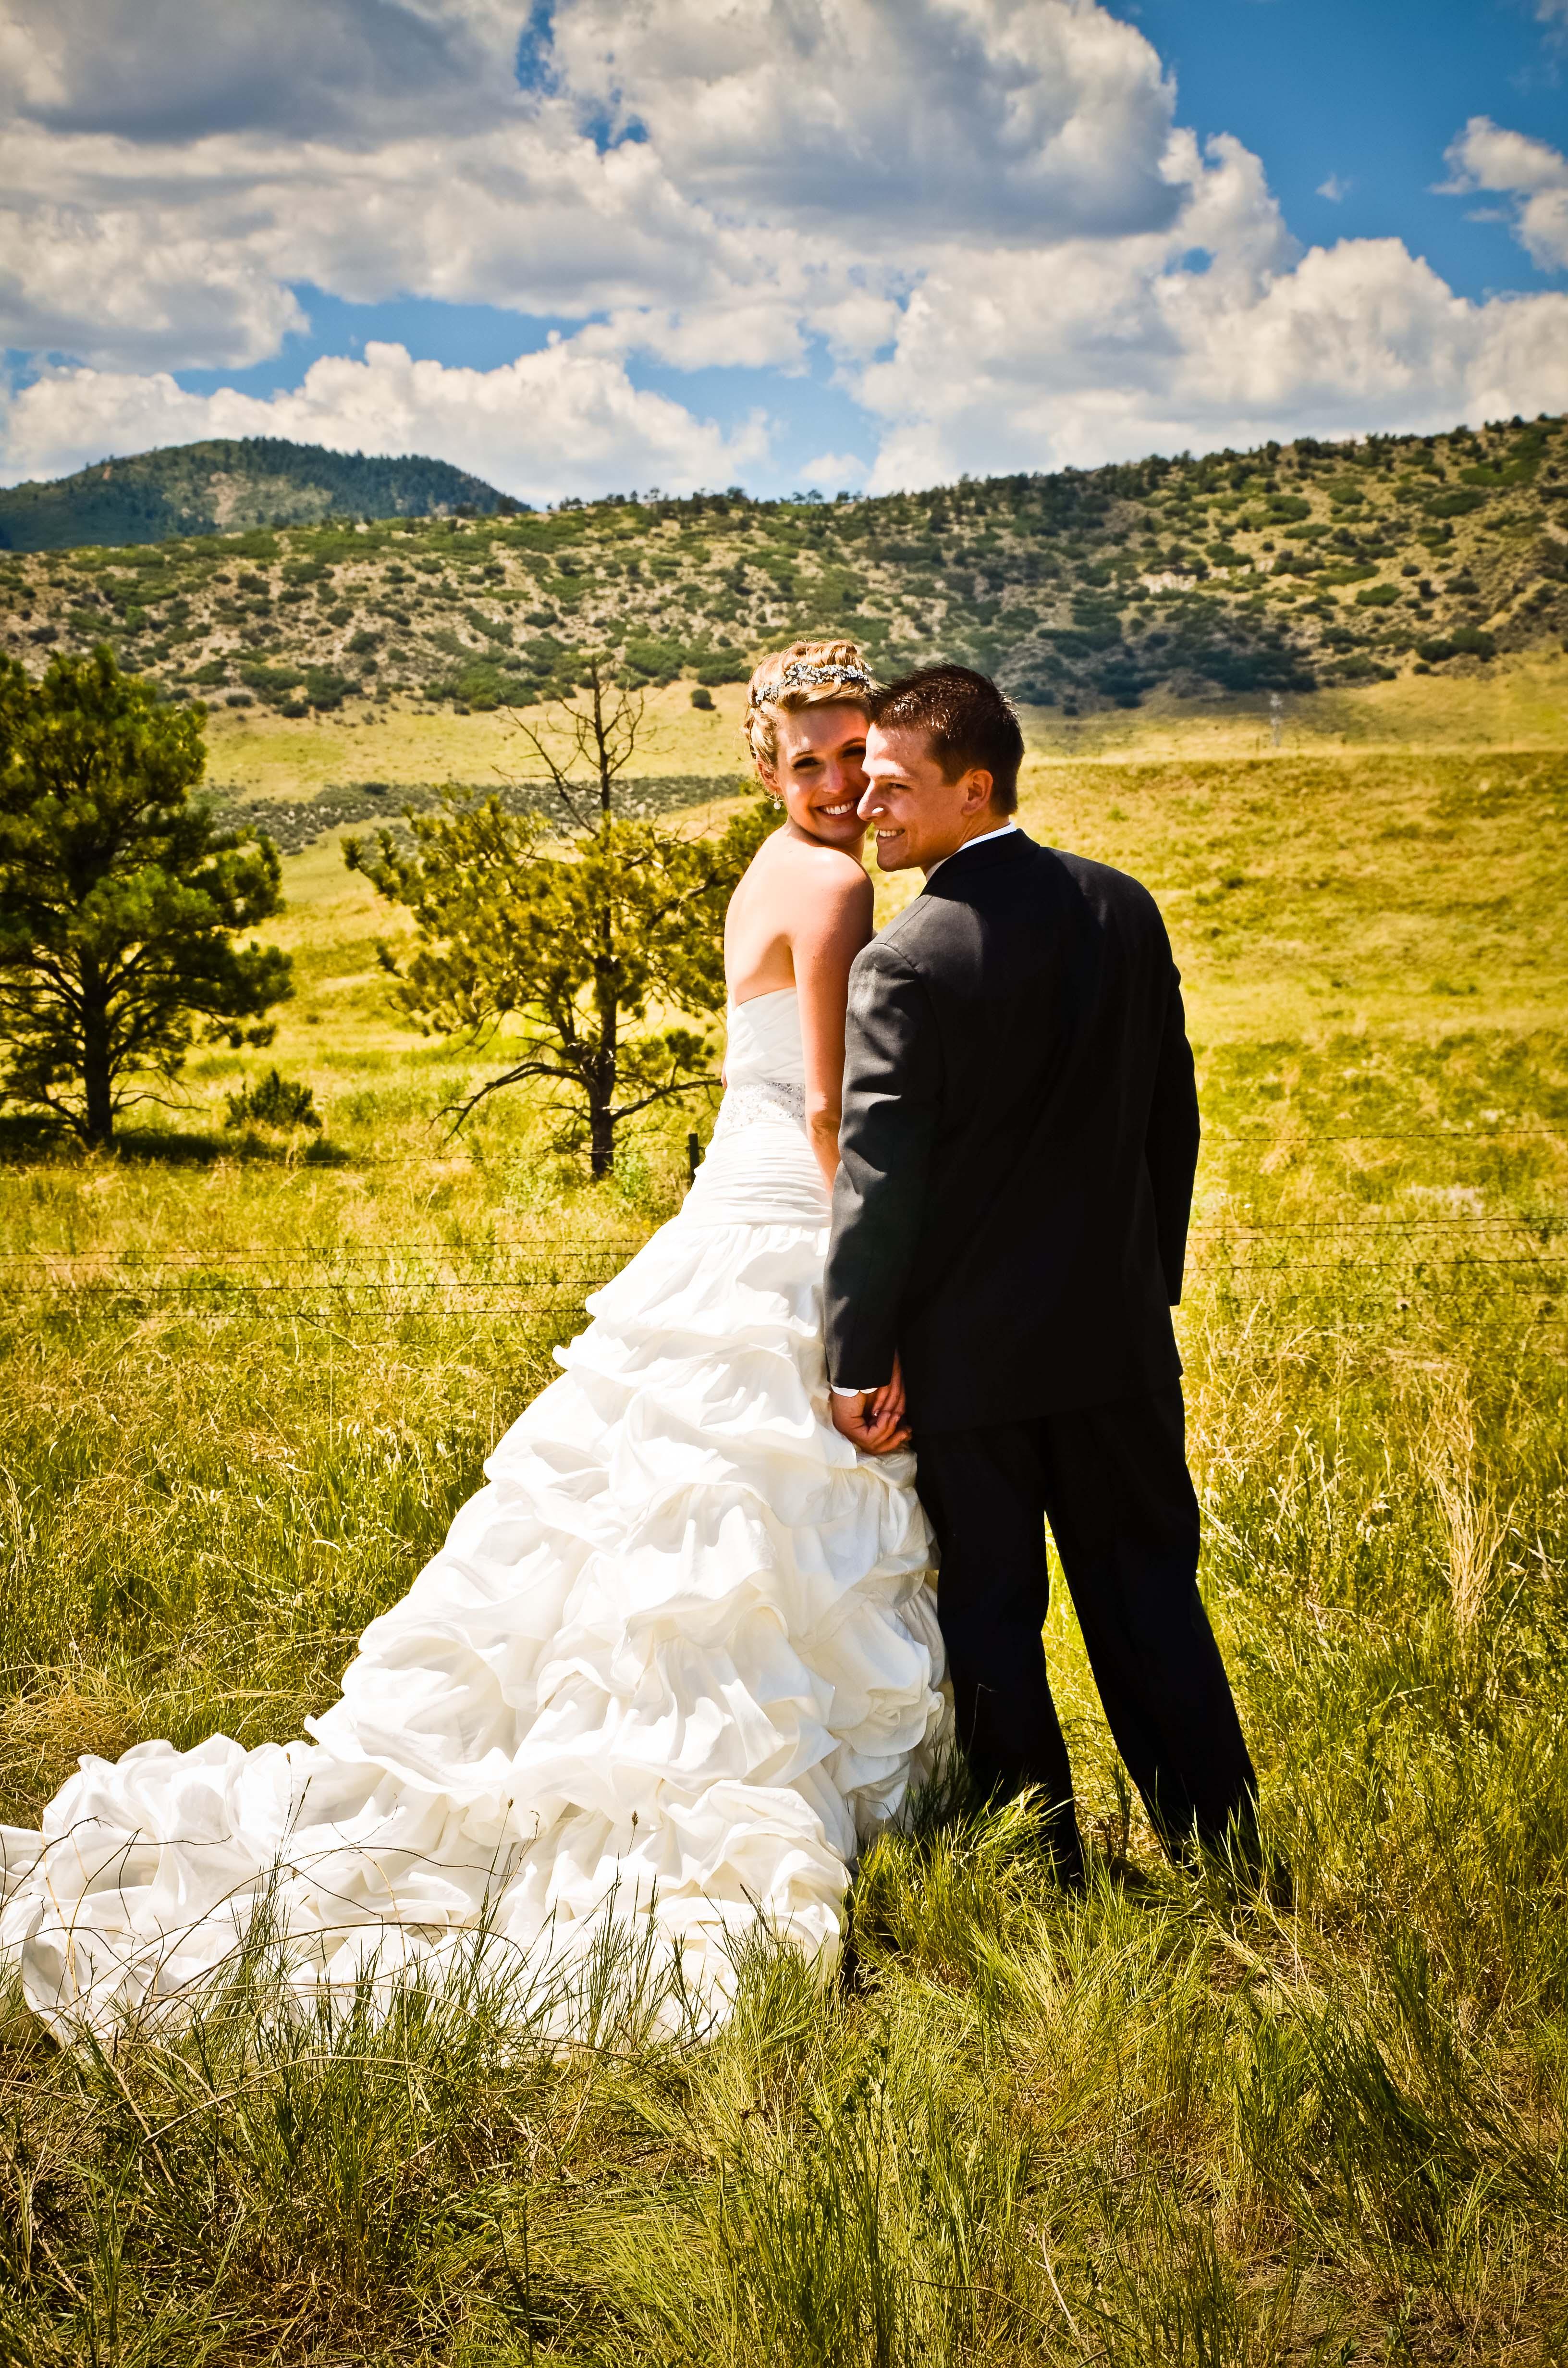 colo mtn wedding - Wedding-planner Denver